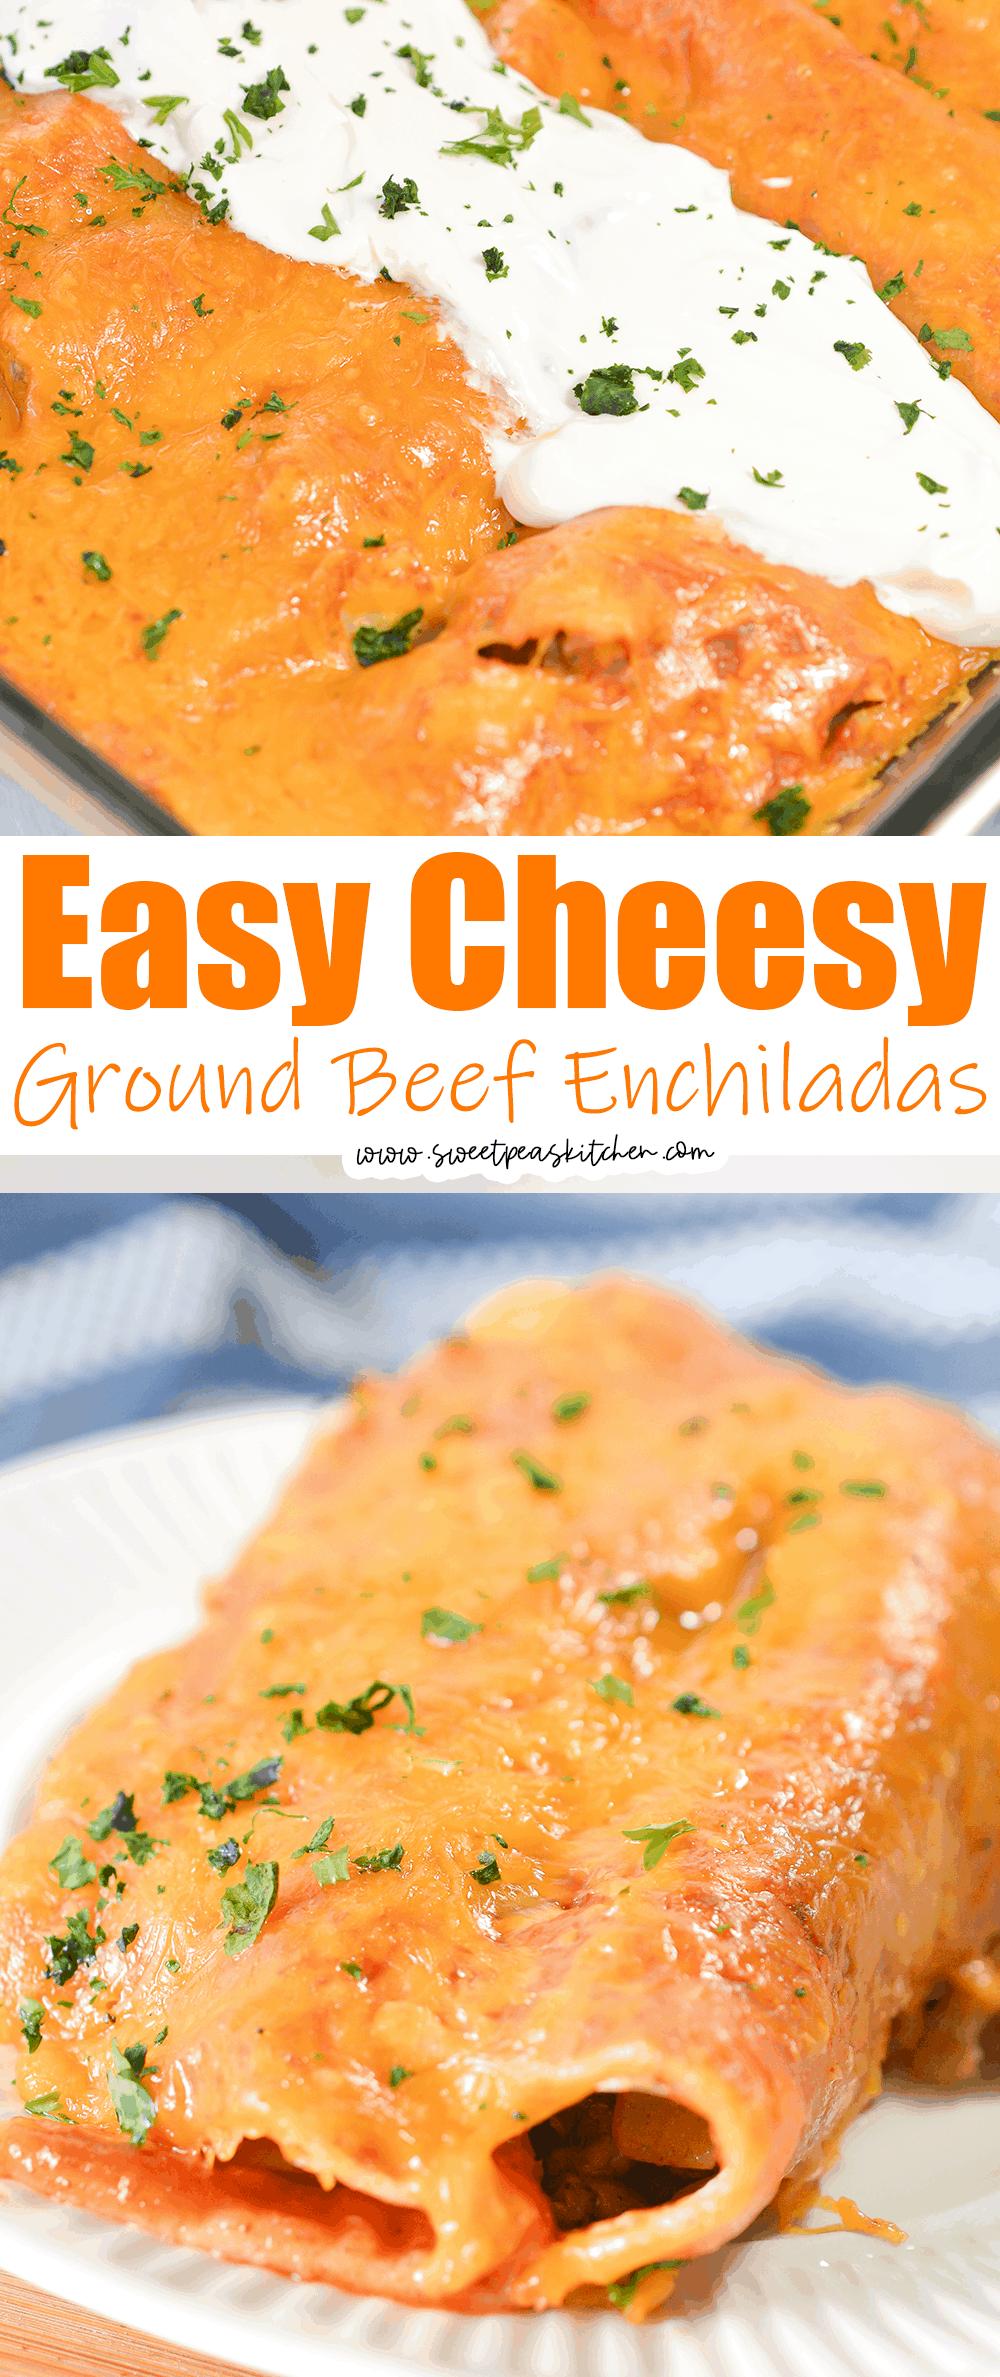 Easy Cheesy Ground Beef Enchiladas